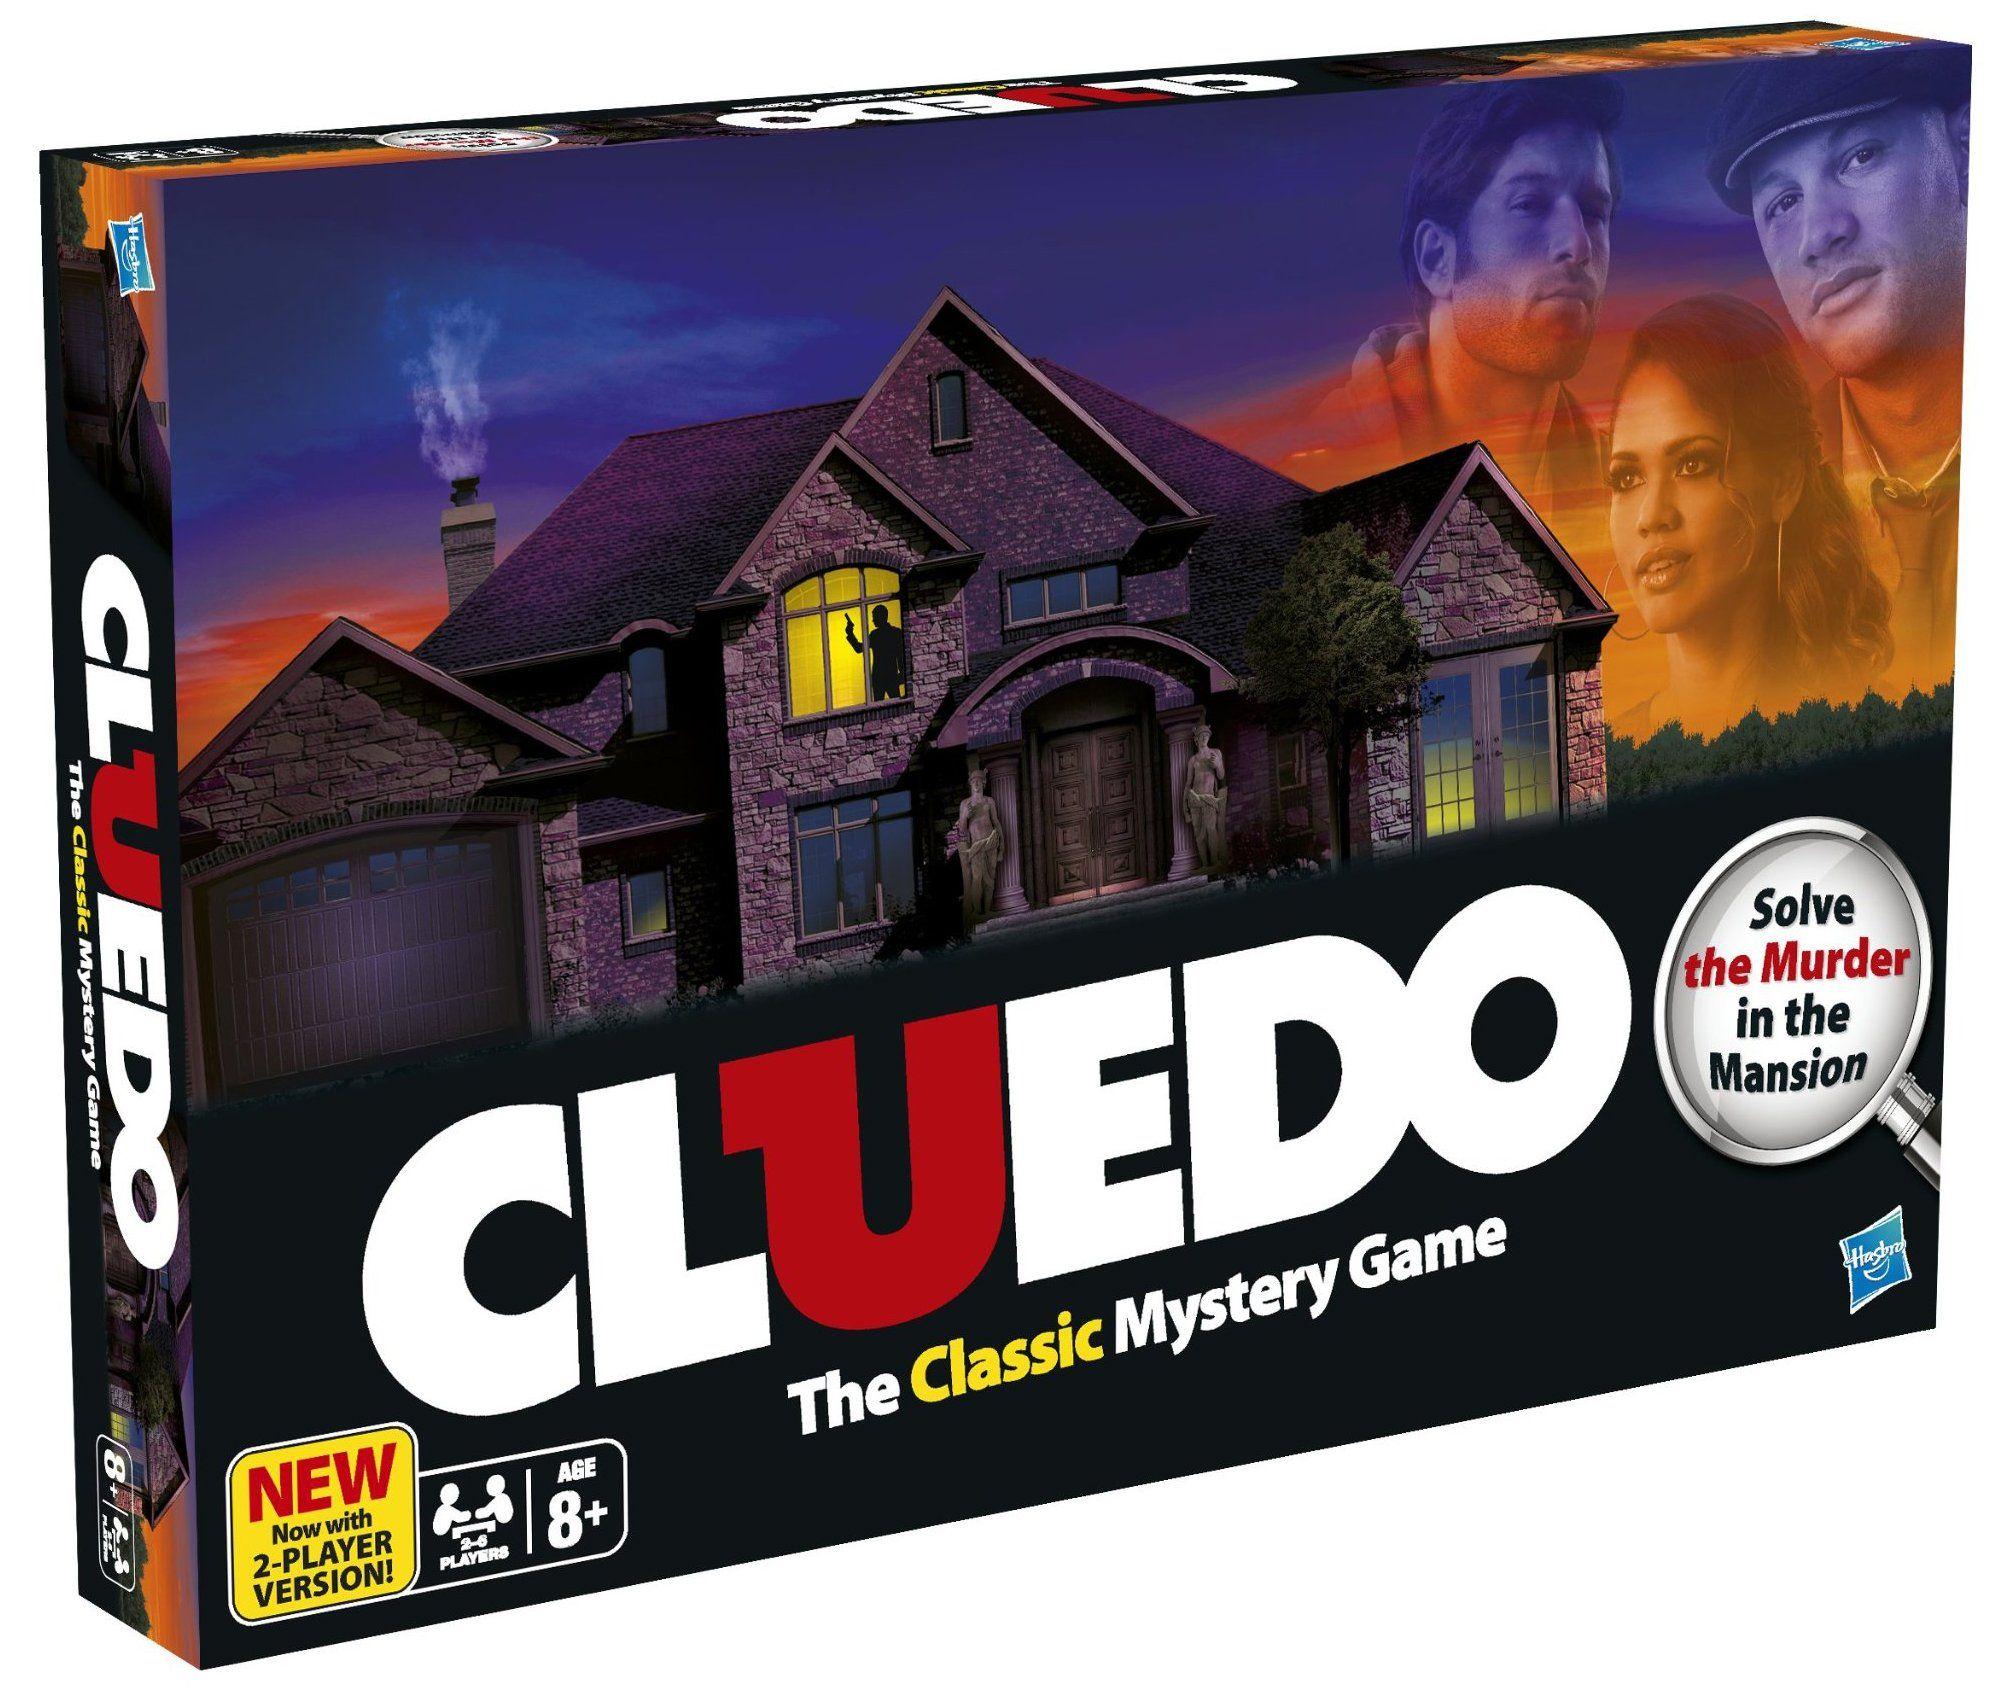 Cluedo Board Game Cluedo, Planches de jeu, Jeux detective